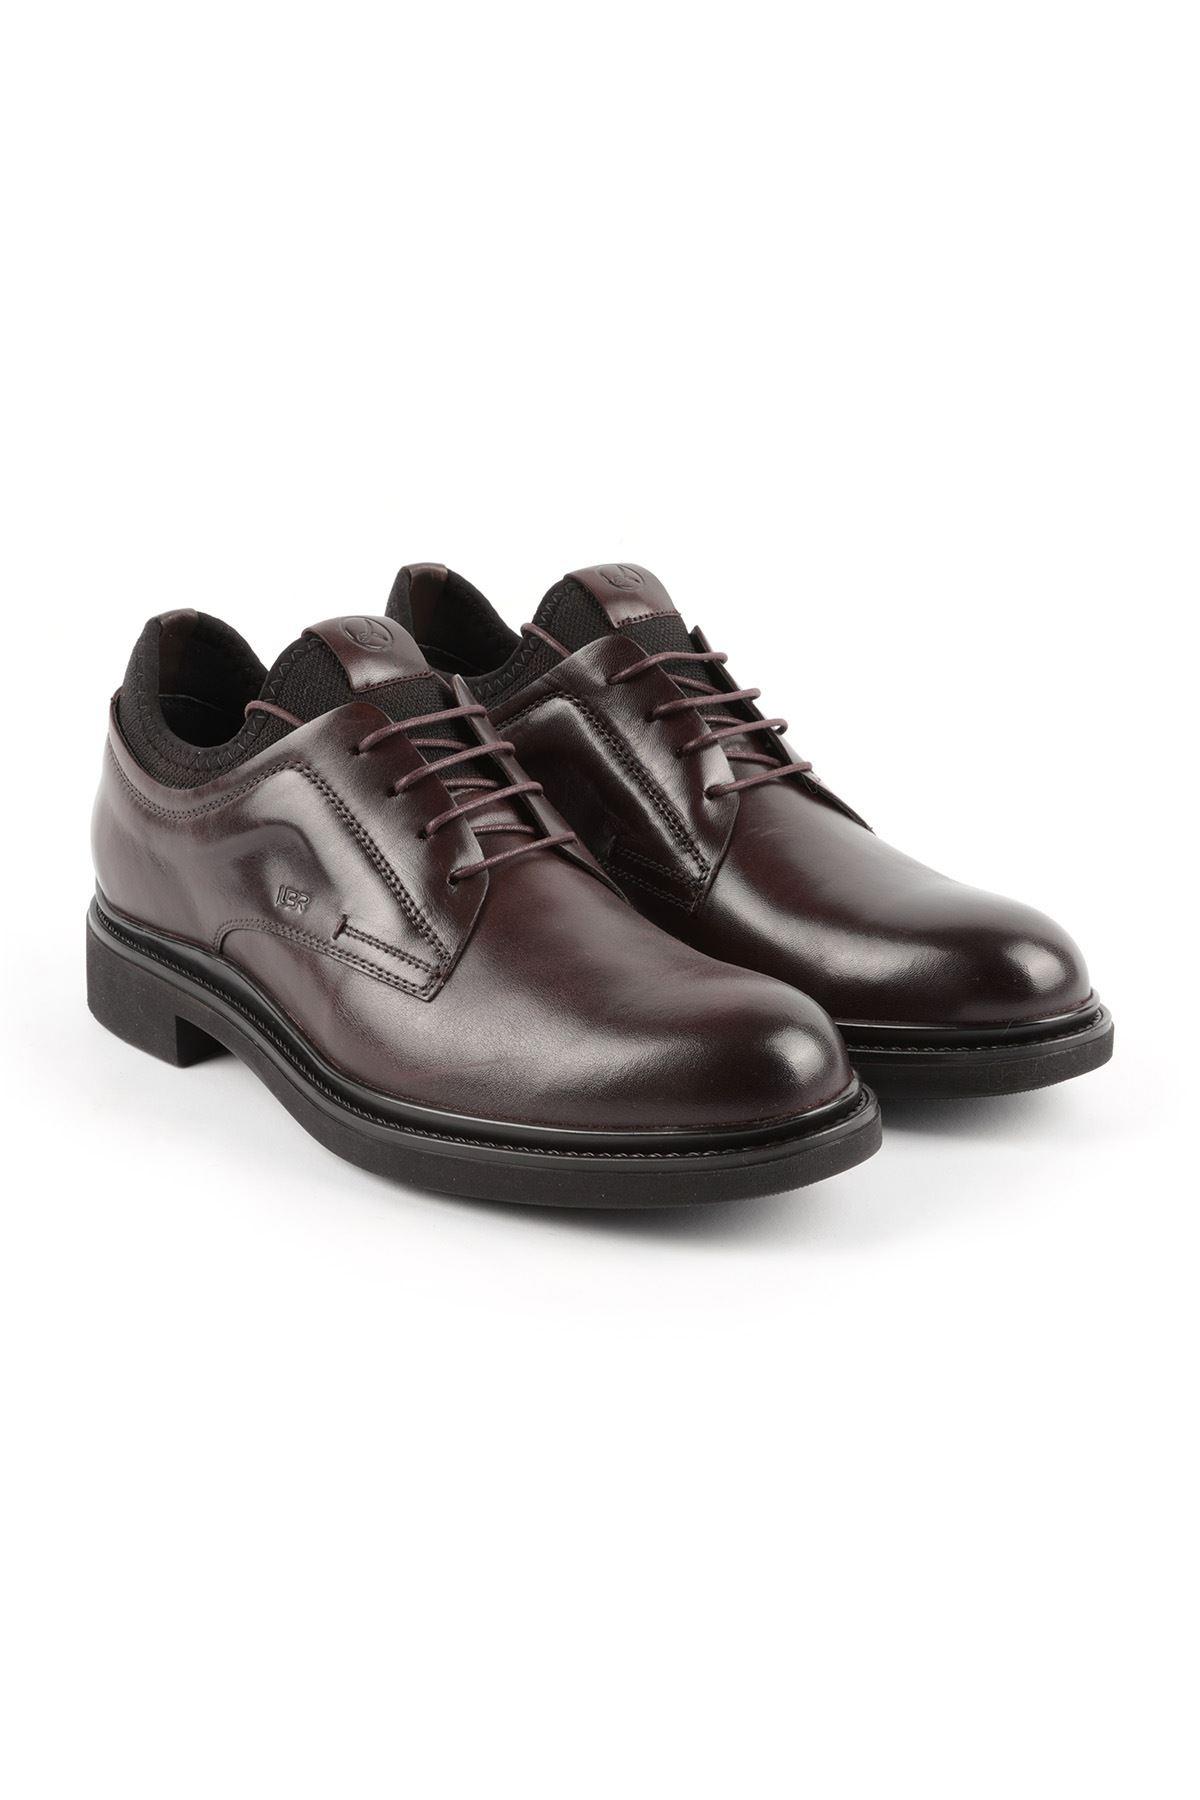 Libero L3456 EA Kahverengi Erkek Ayakkabı